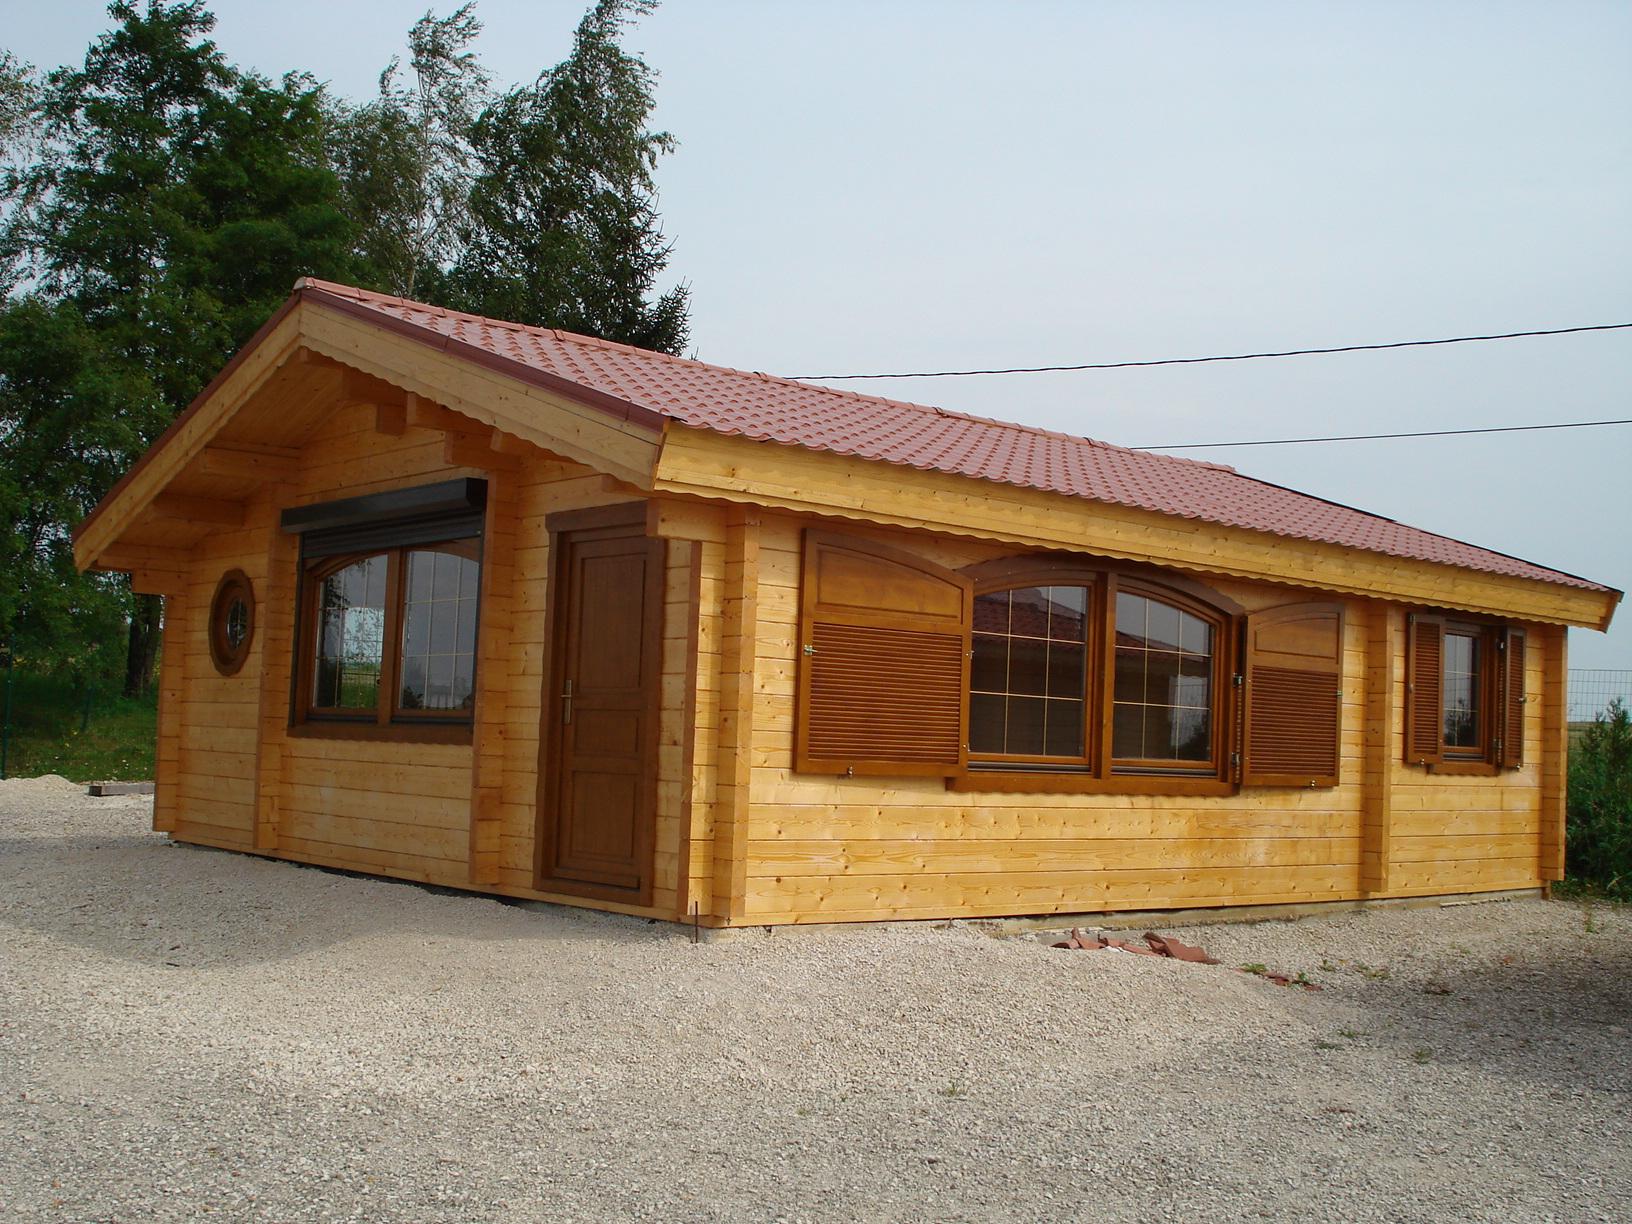 Chalet Habitable Jade | Chalet En Bois pour Chalet En Kit Bois